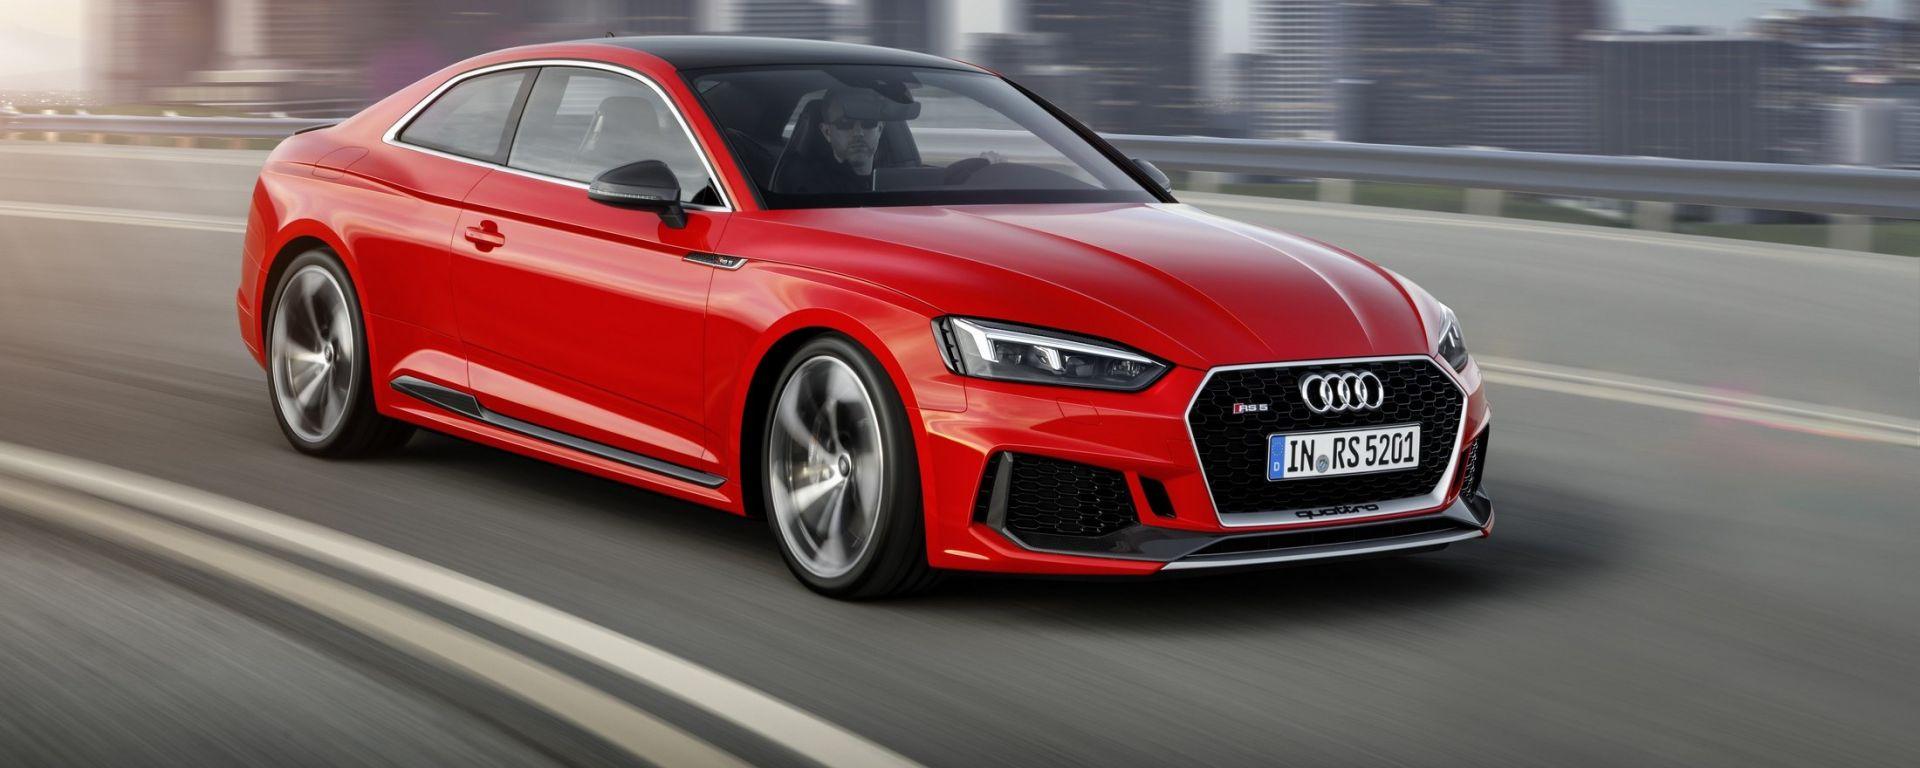 Audi RS5 Coupé: la prova su strada